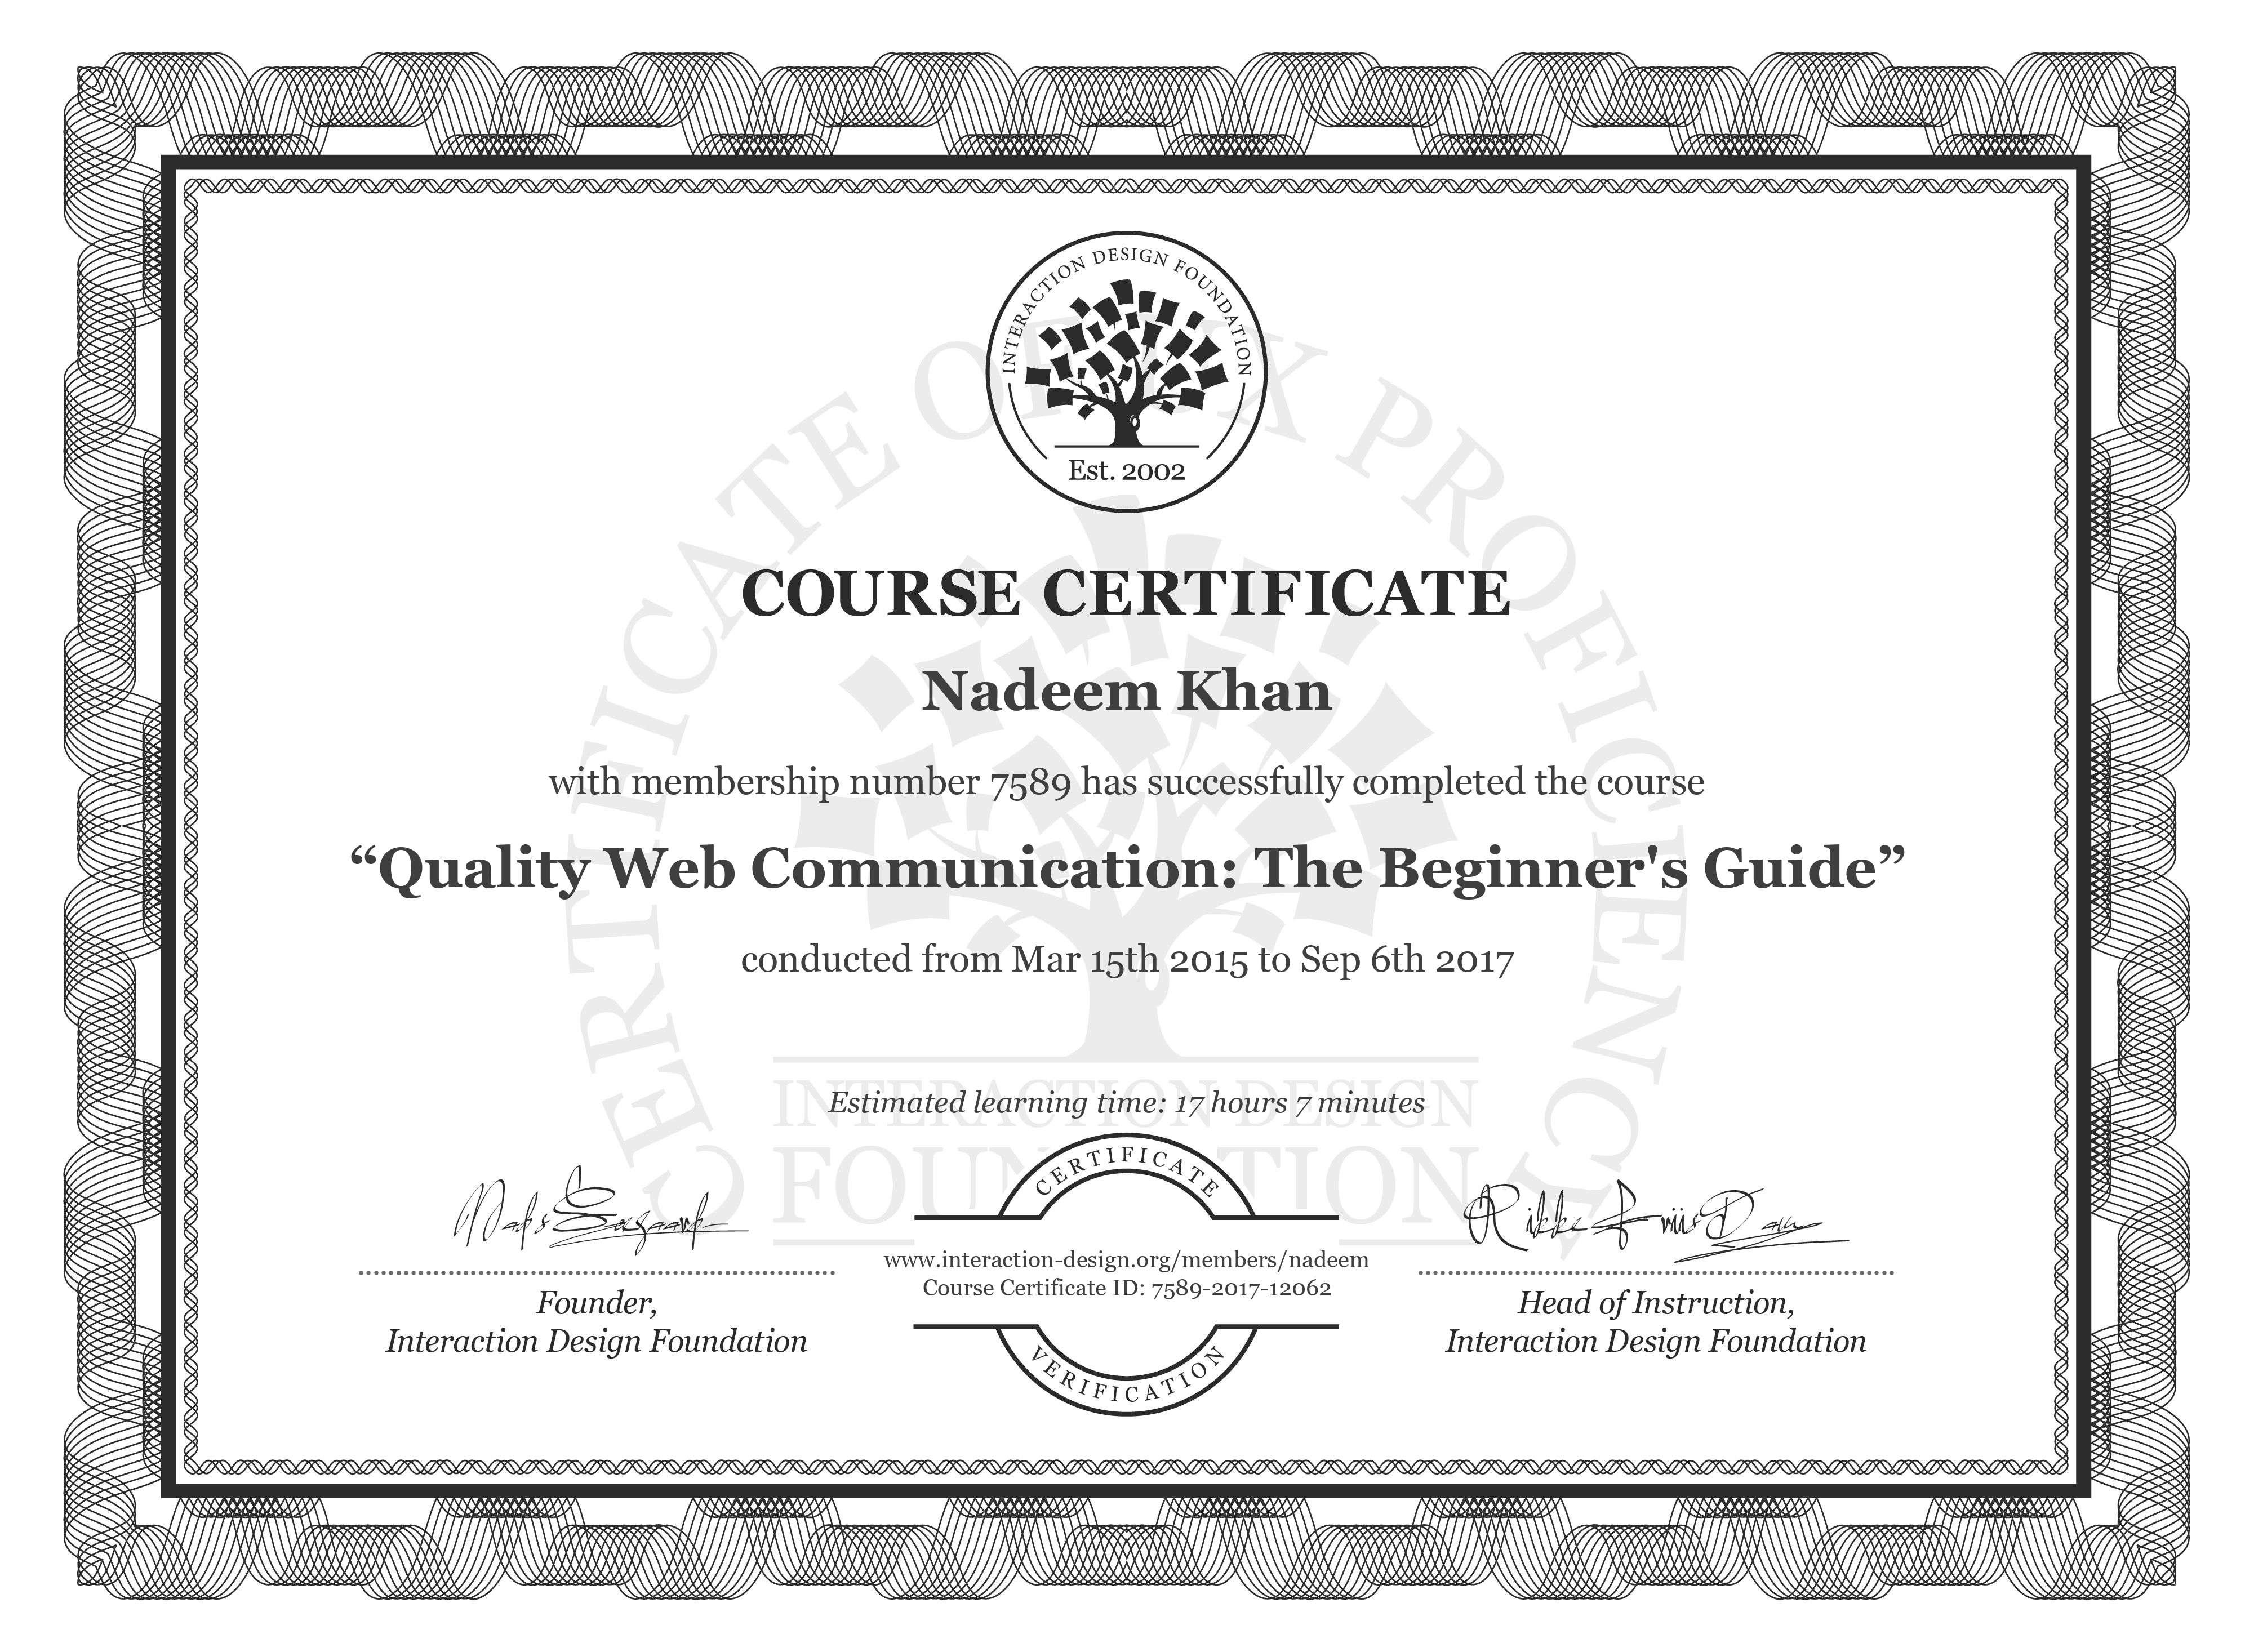 Nadeem Khan: Course Certificate - Quality Web Communication: The Beginner's Guide